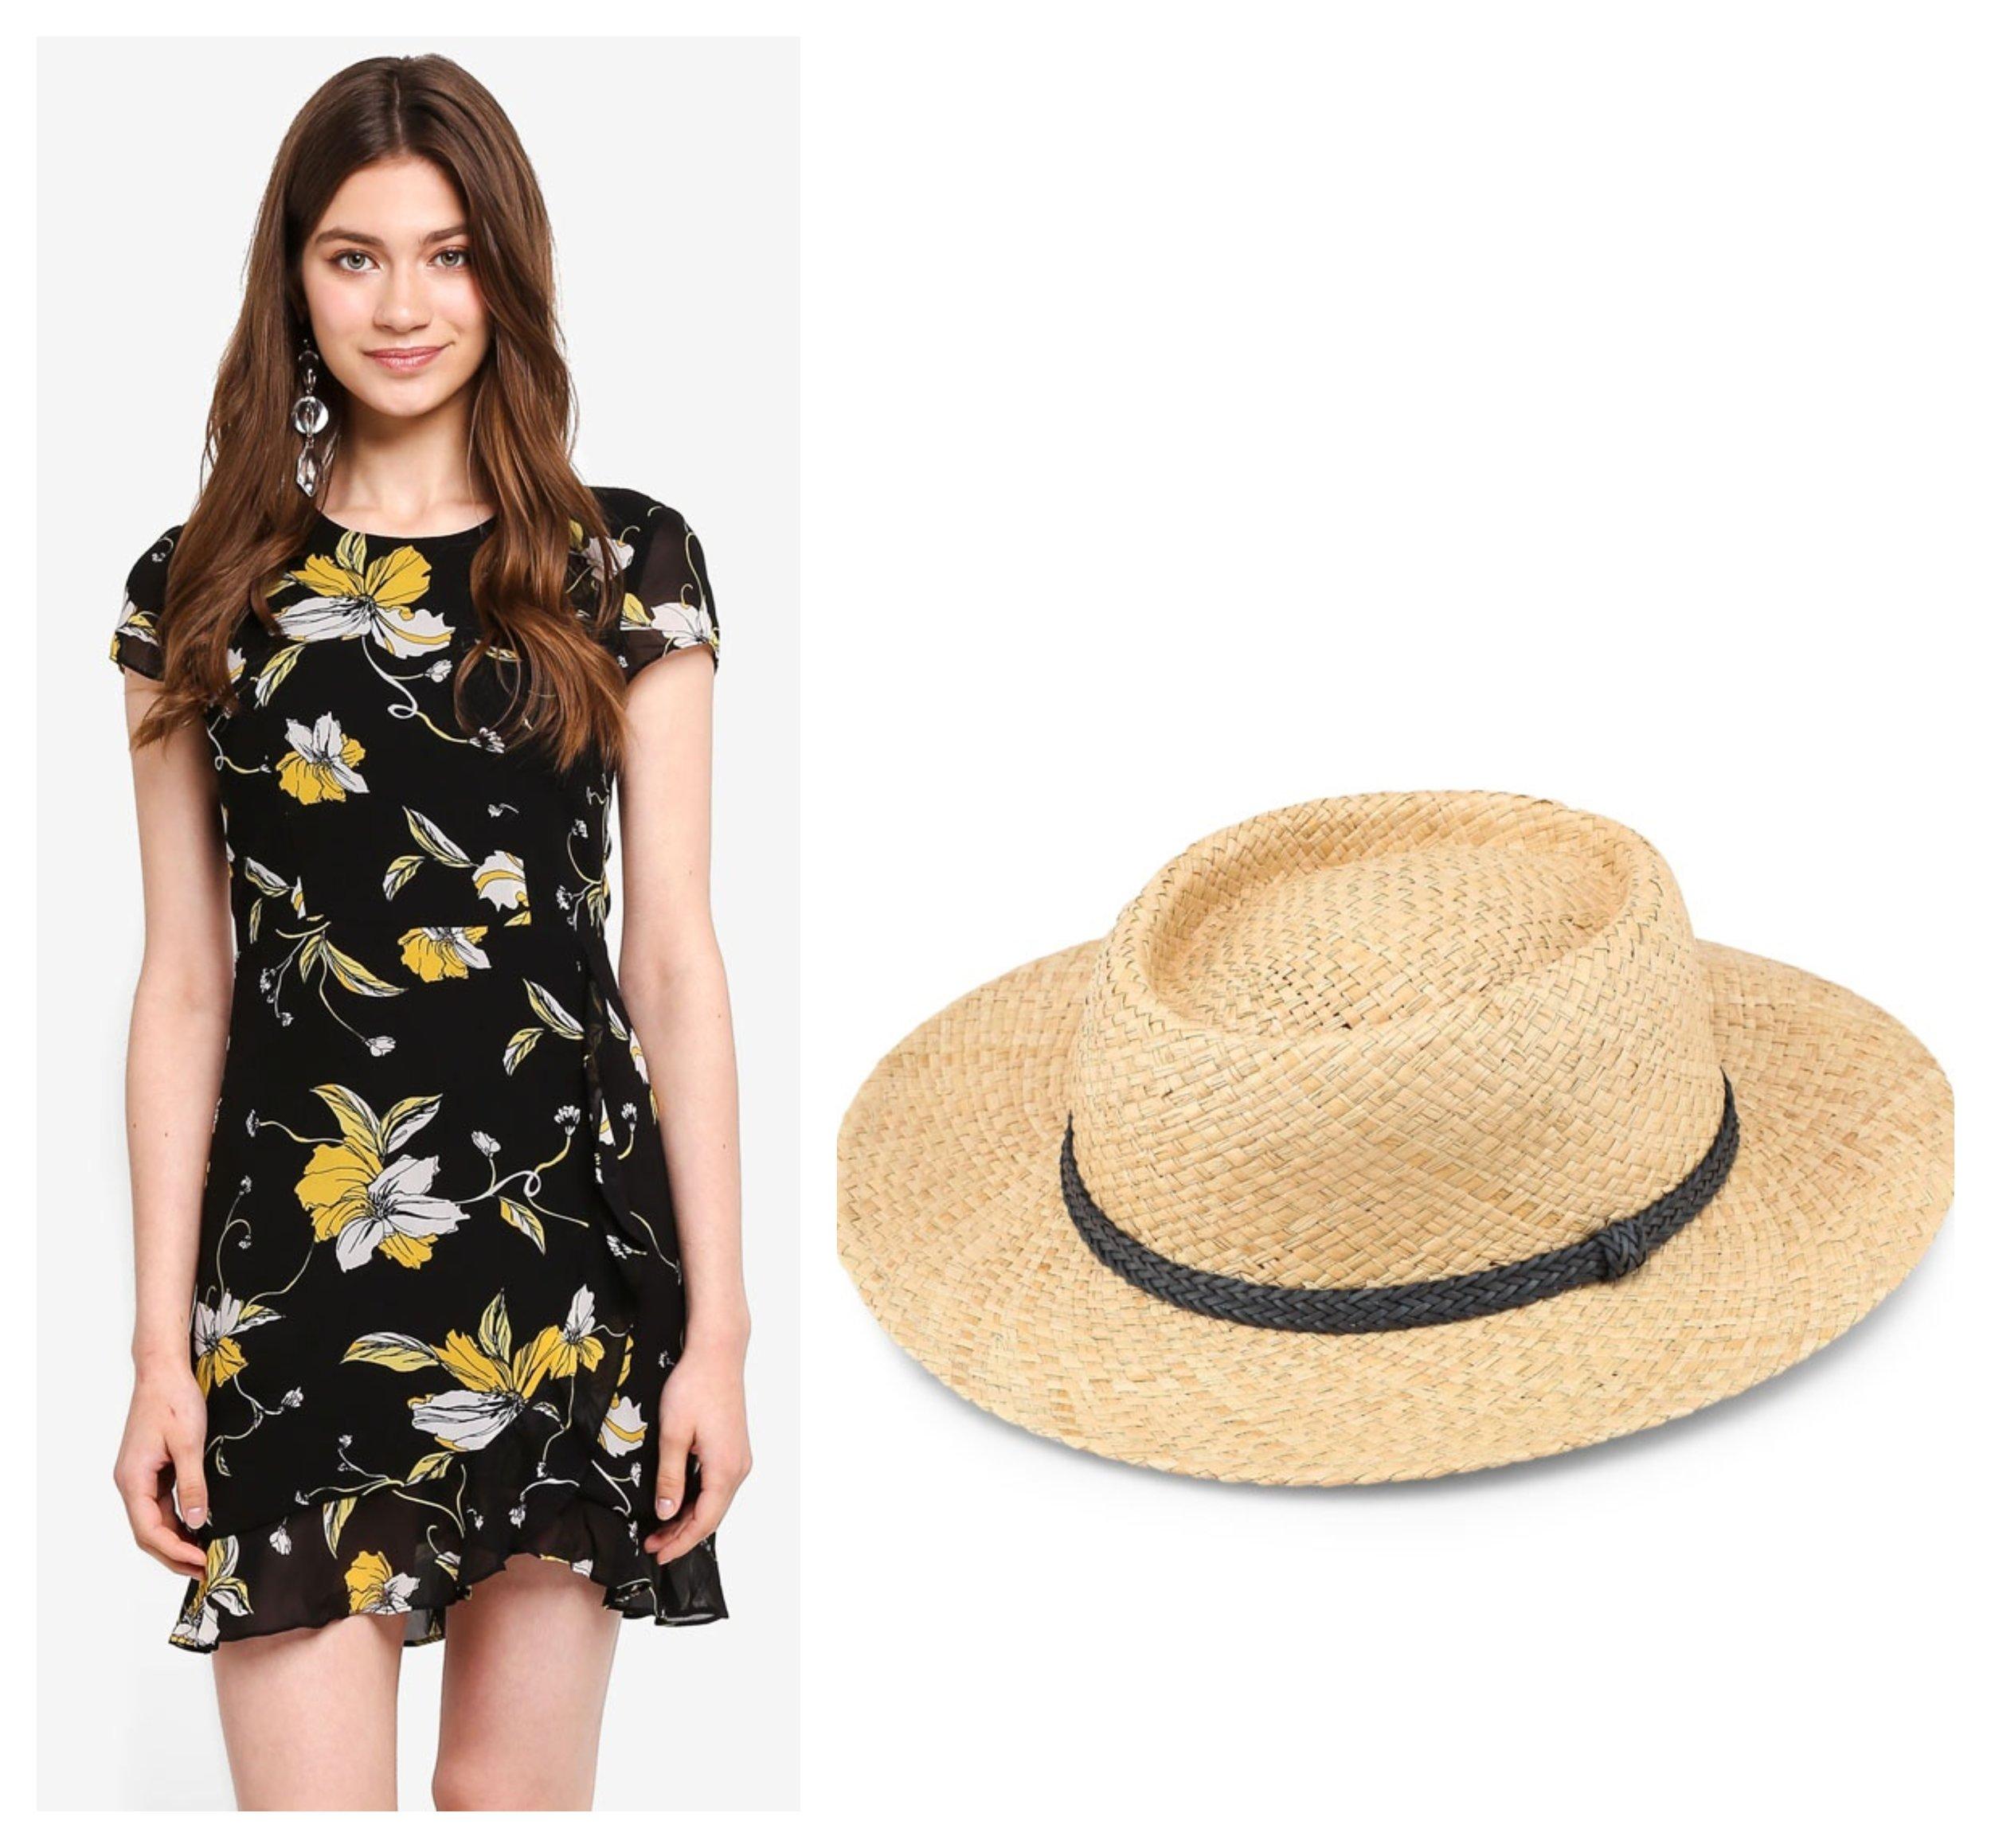 BARDOT Lucy Dress  I  TOPSHOP Straw Flat Top Hat